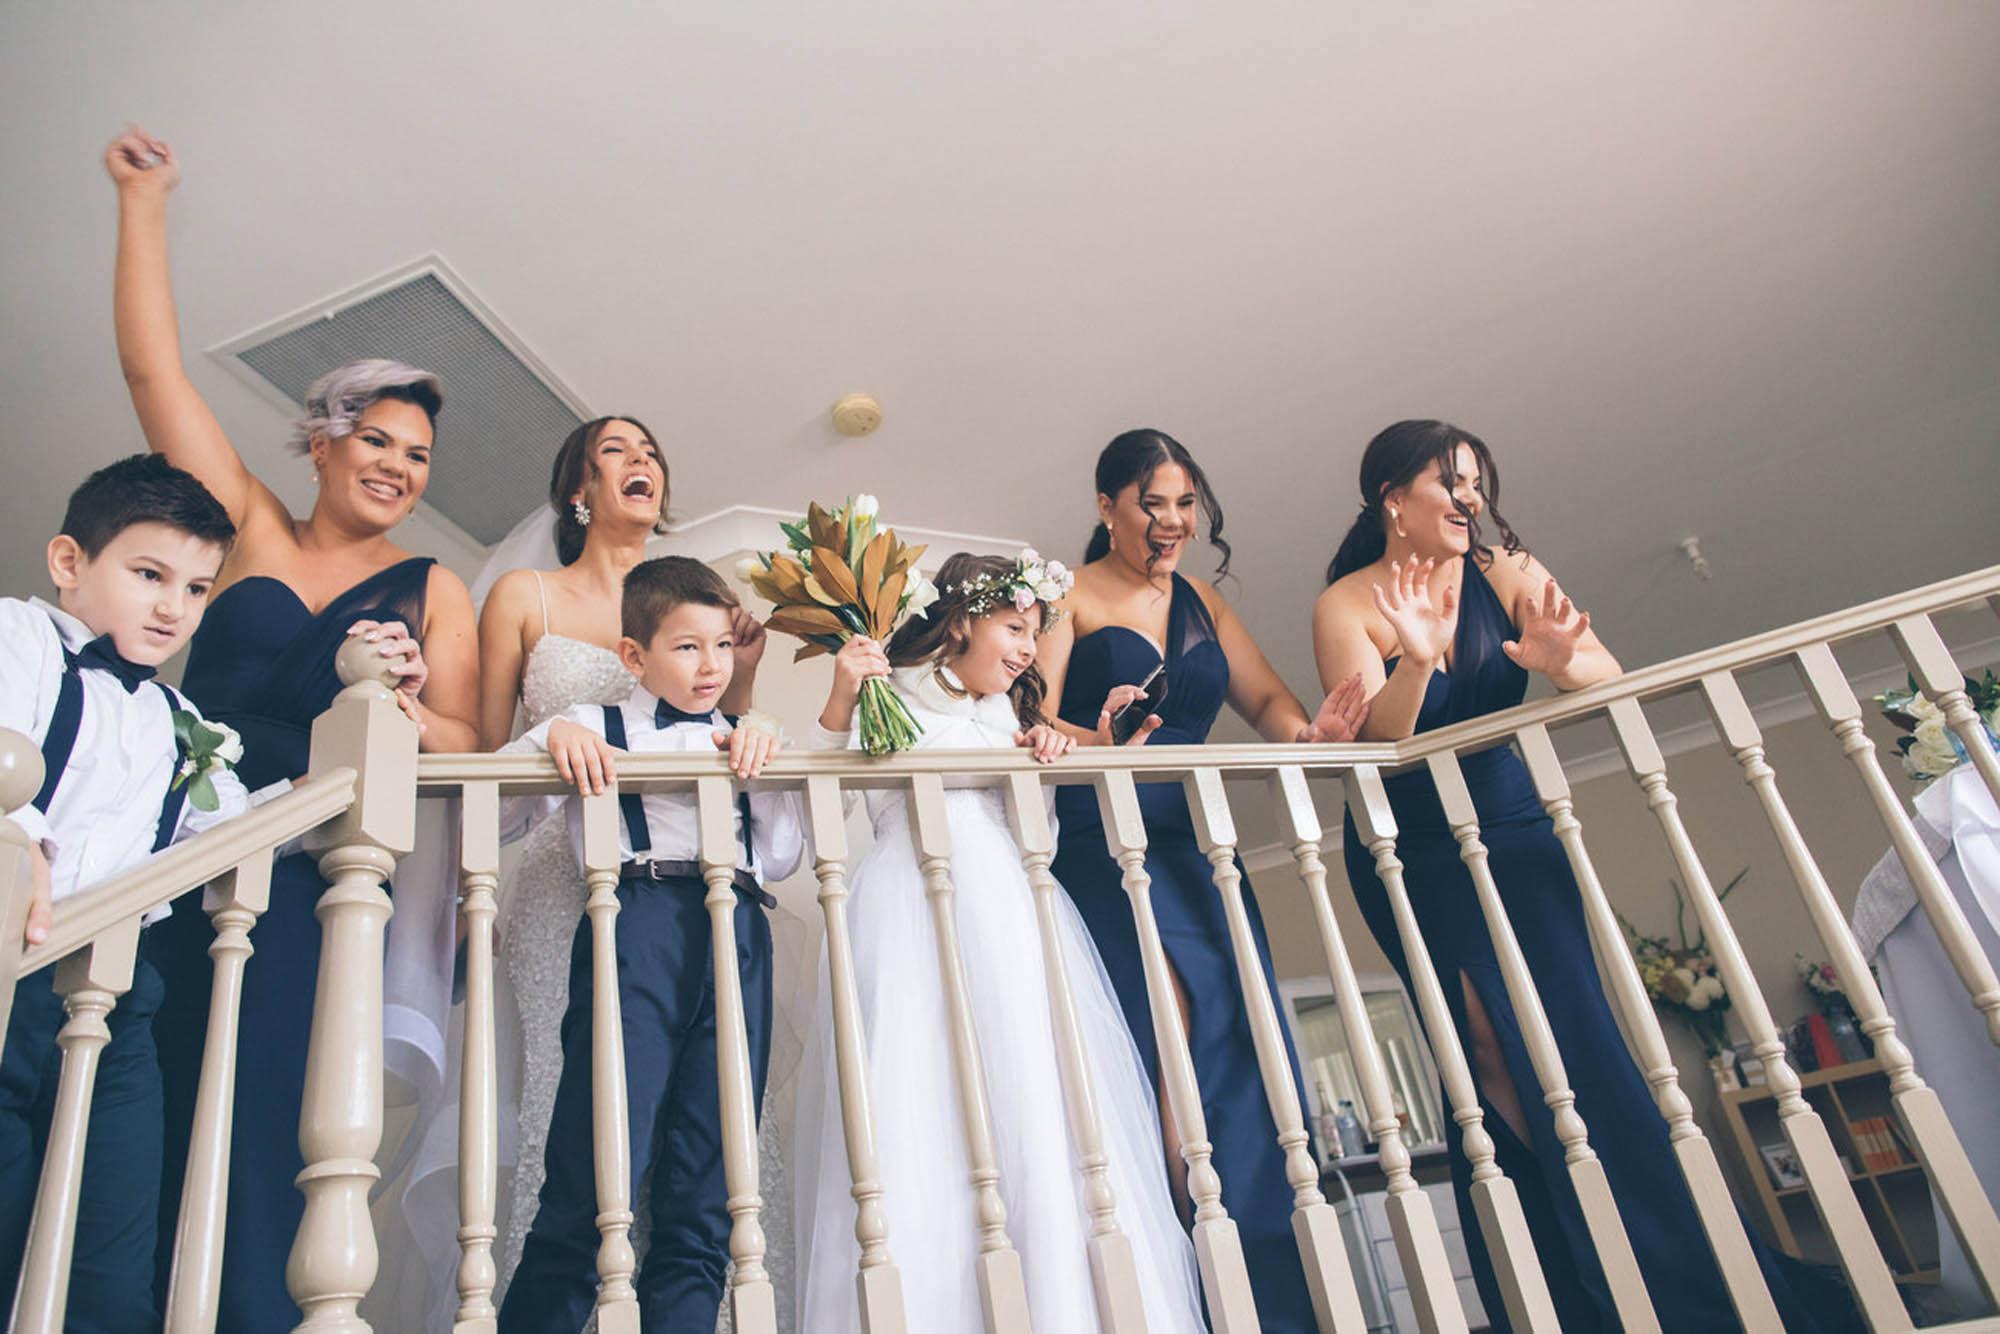 MacDougall-Photography-Sydney-Wedding-Photographers-23.jpg